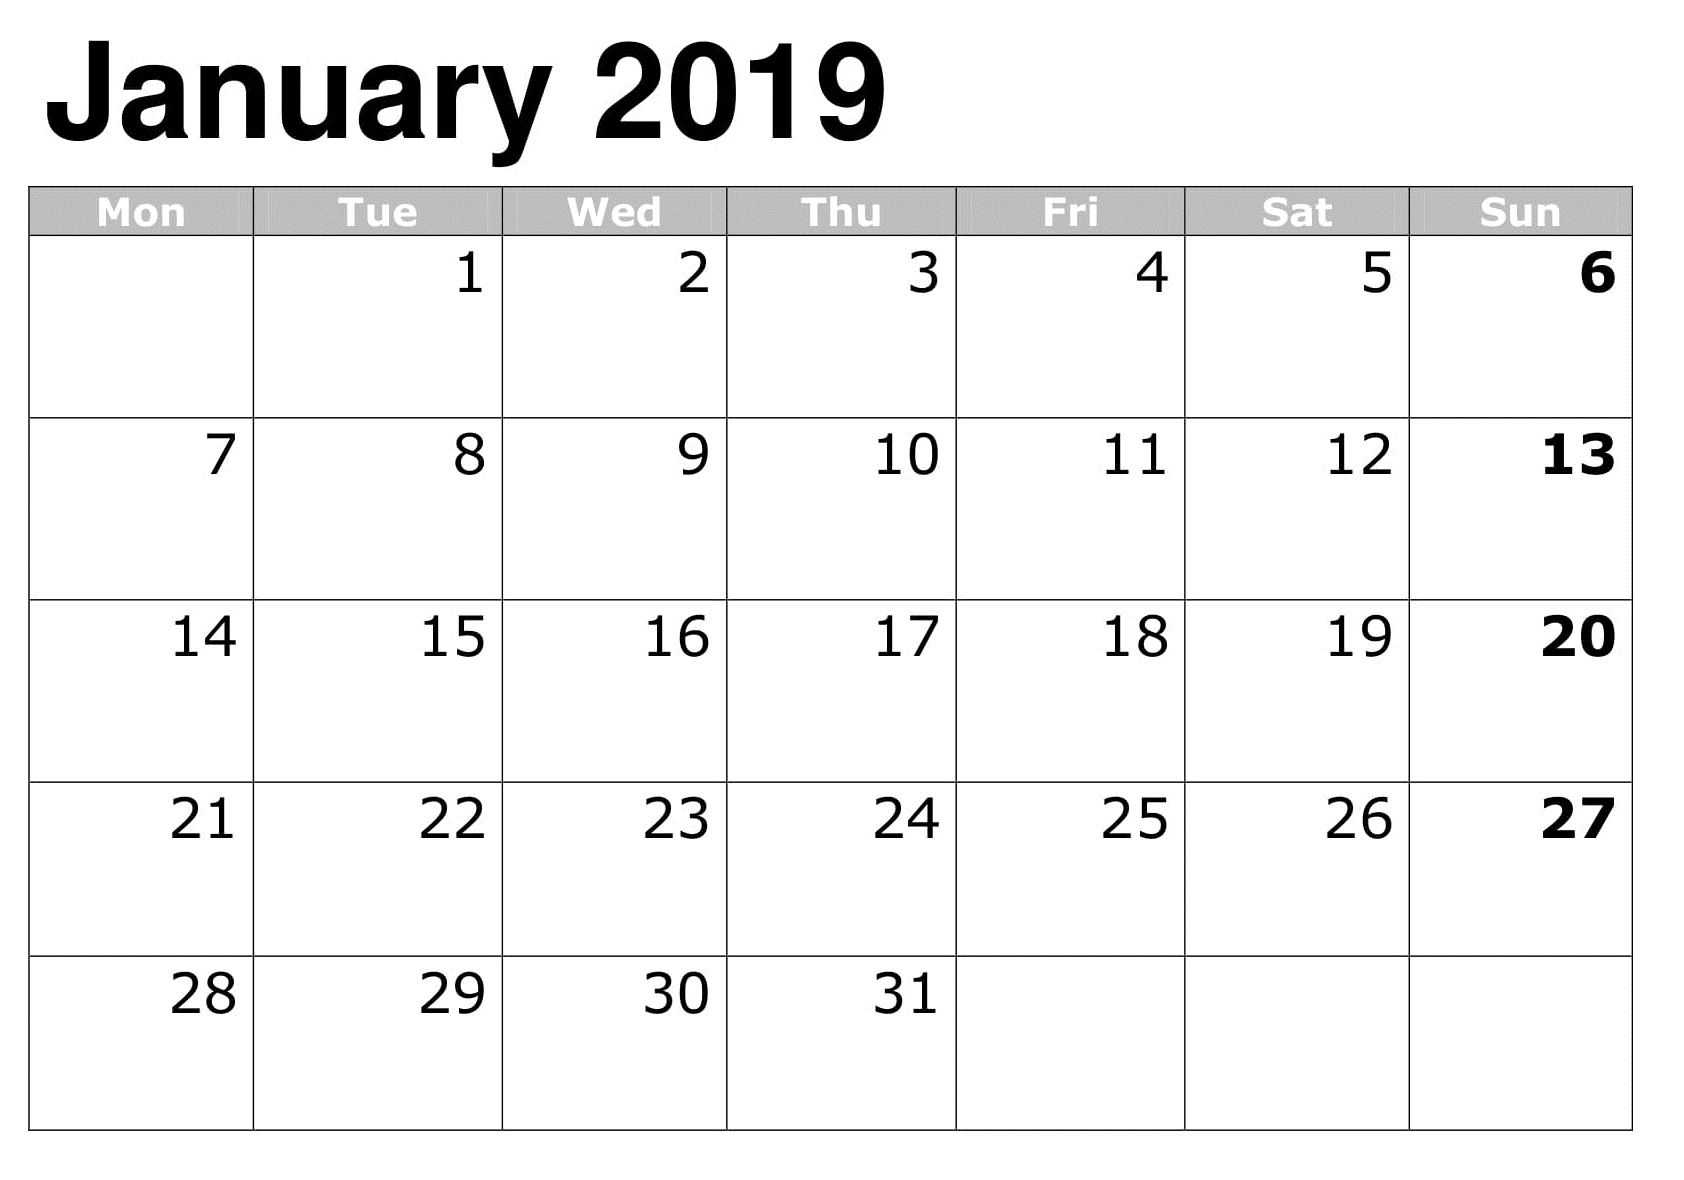 January 2019 Calendar Printable Calendar Printables 2019 Calendar